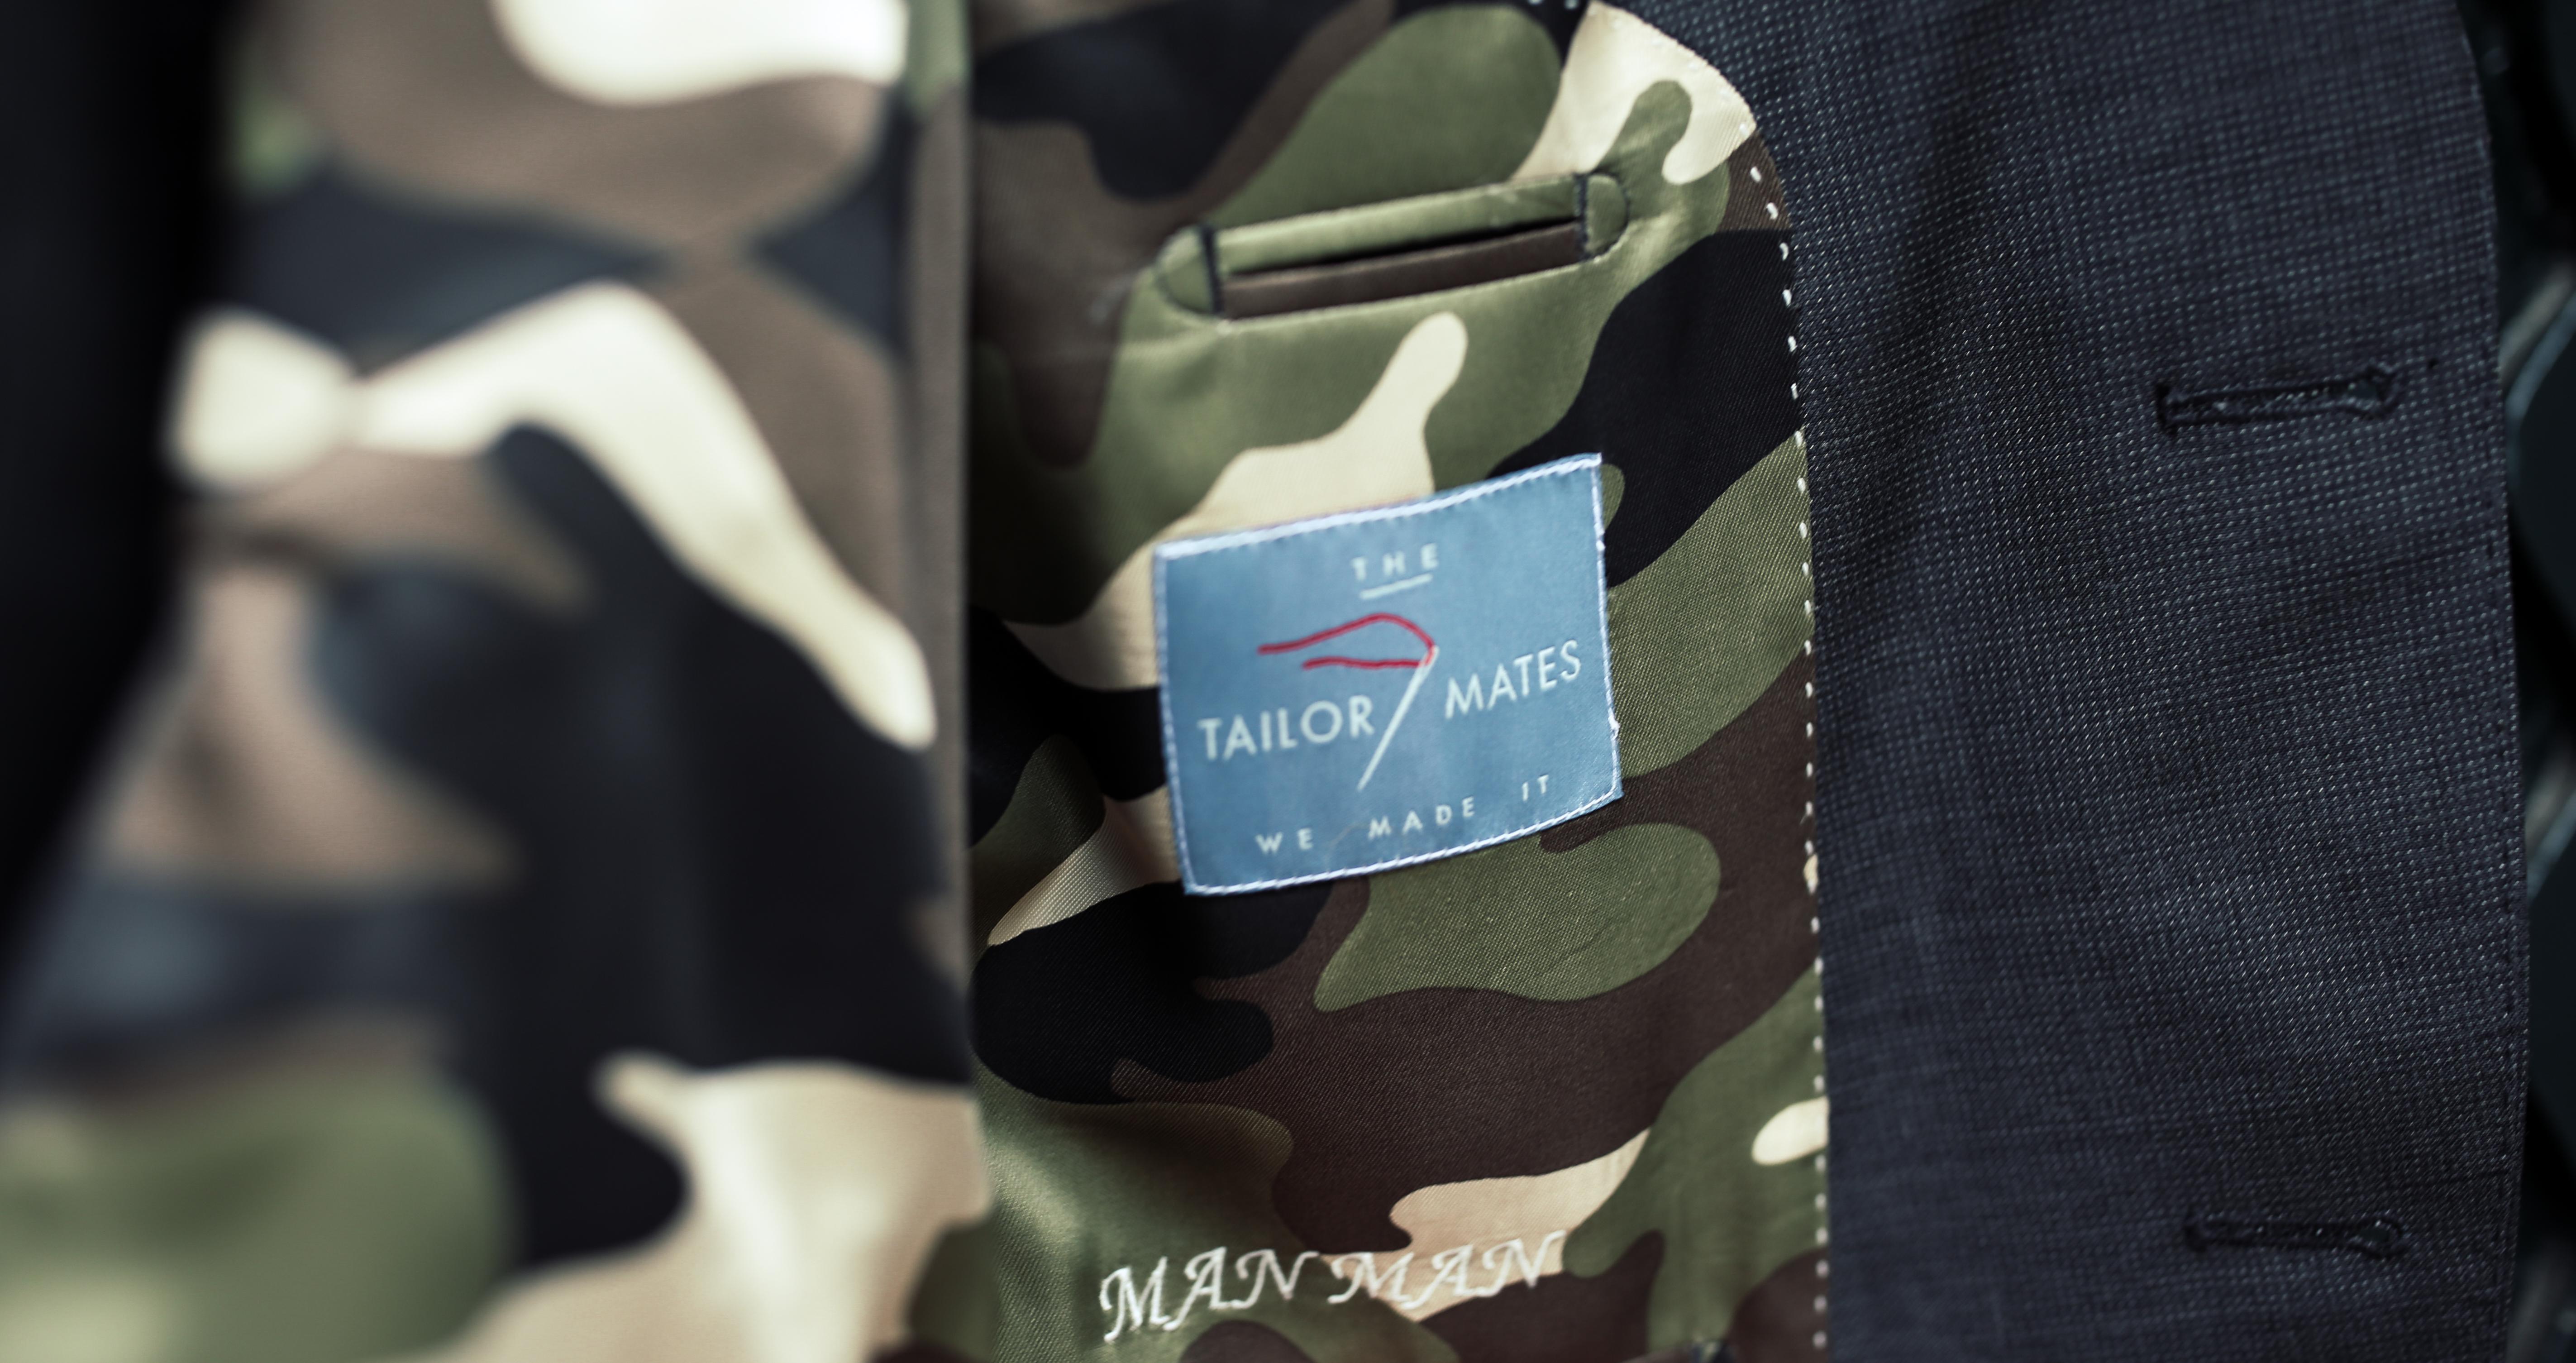 Tailor Mates